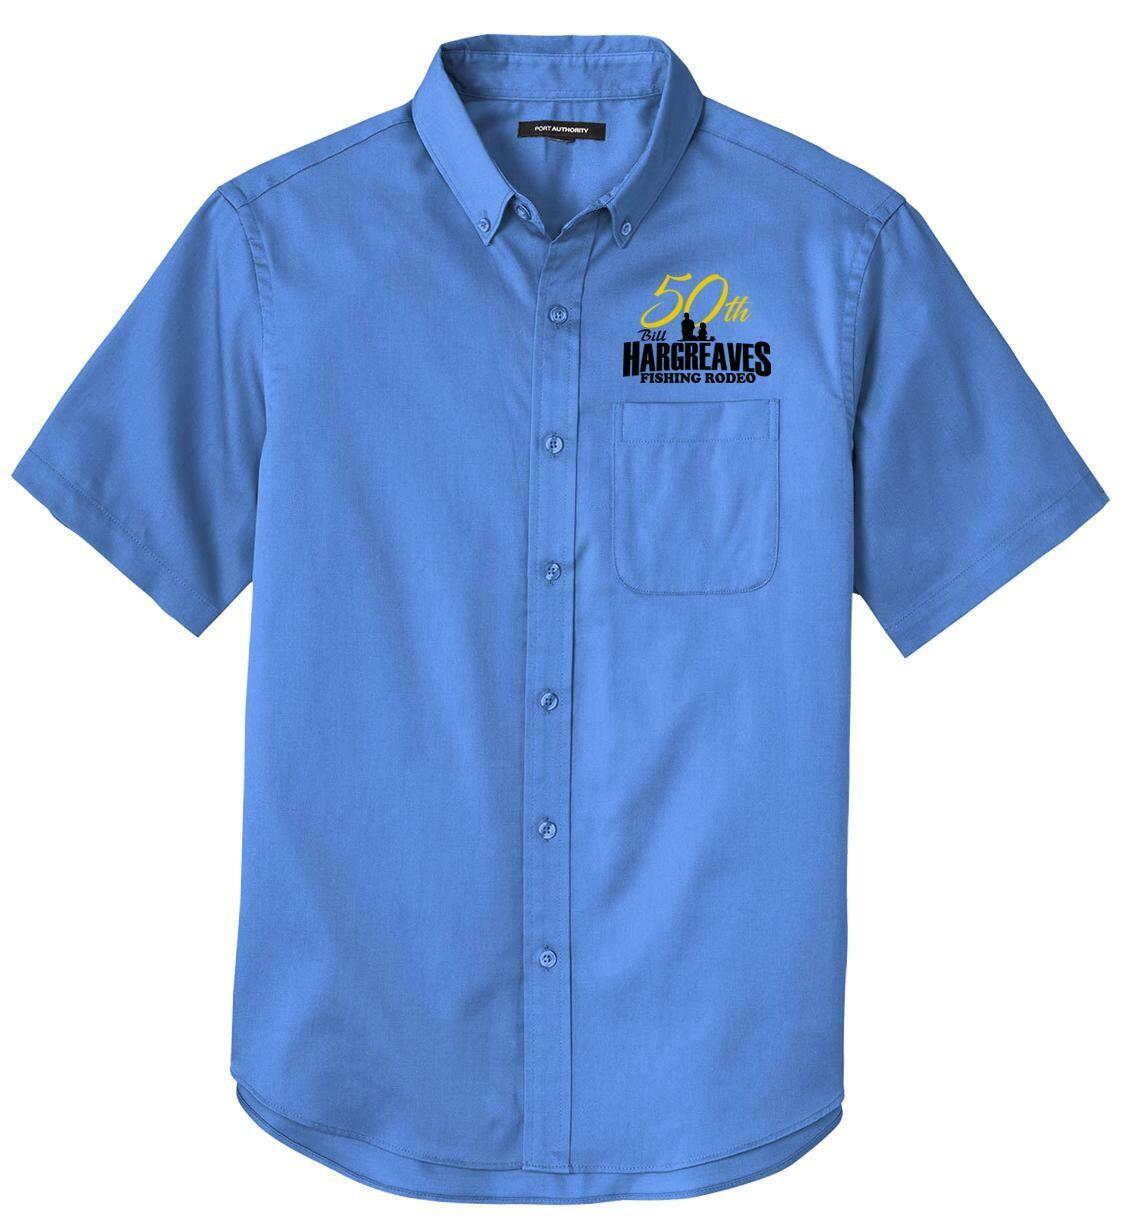 2021 50th Anniversary Hargreaves Fishing Rodeo Short Sleeve Twill Shirt